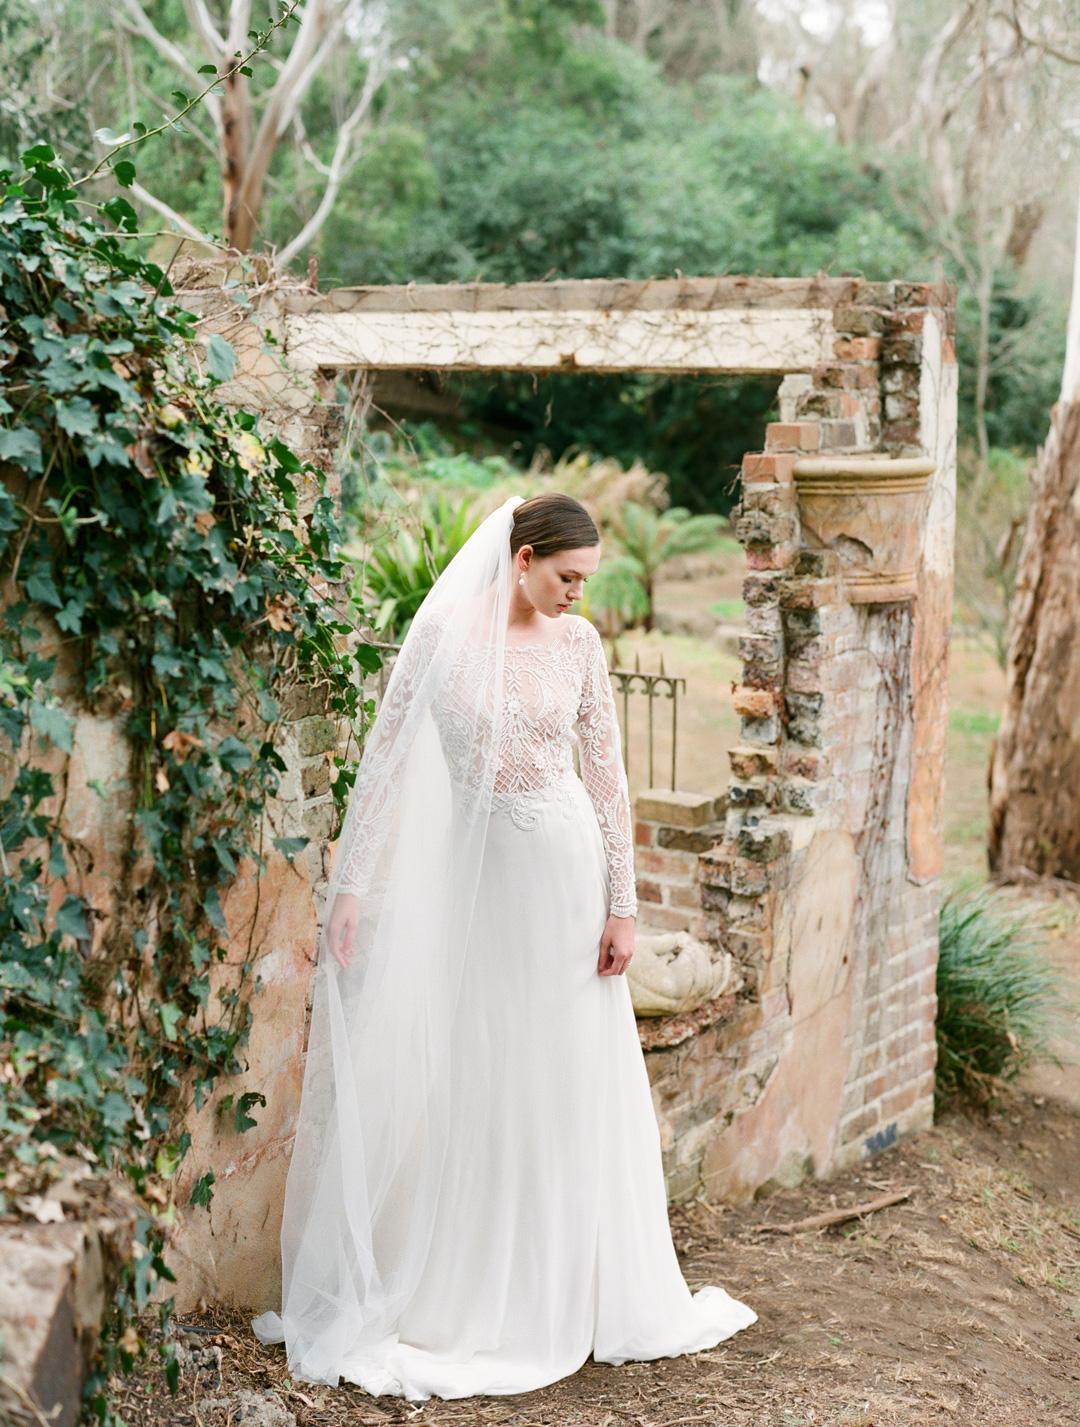 Hopewood-House-Natures-Embrace-Photoshoot-Amelia-Soegijono-Photography-3.jpg